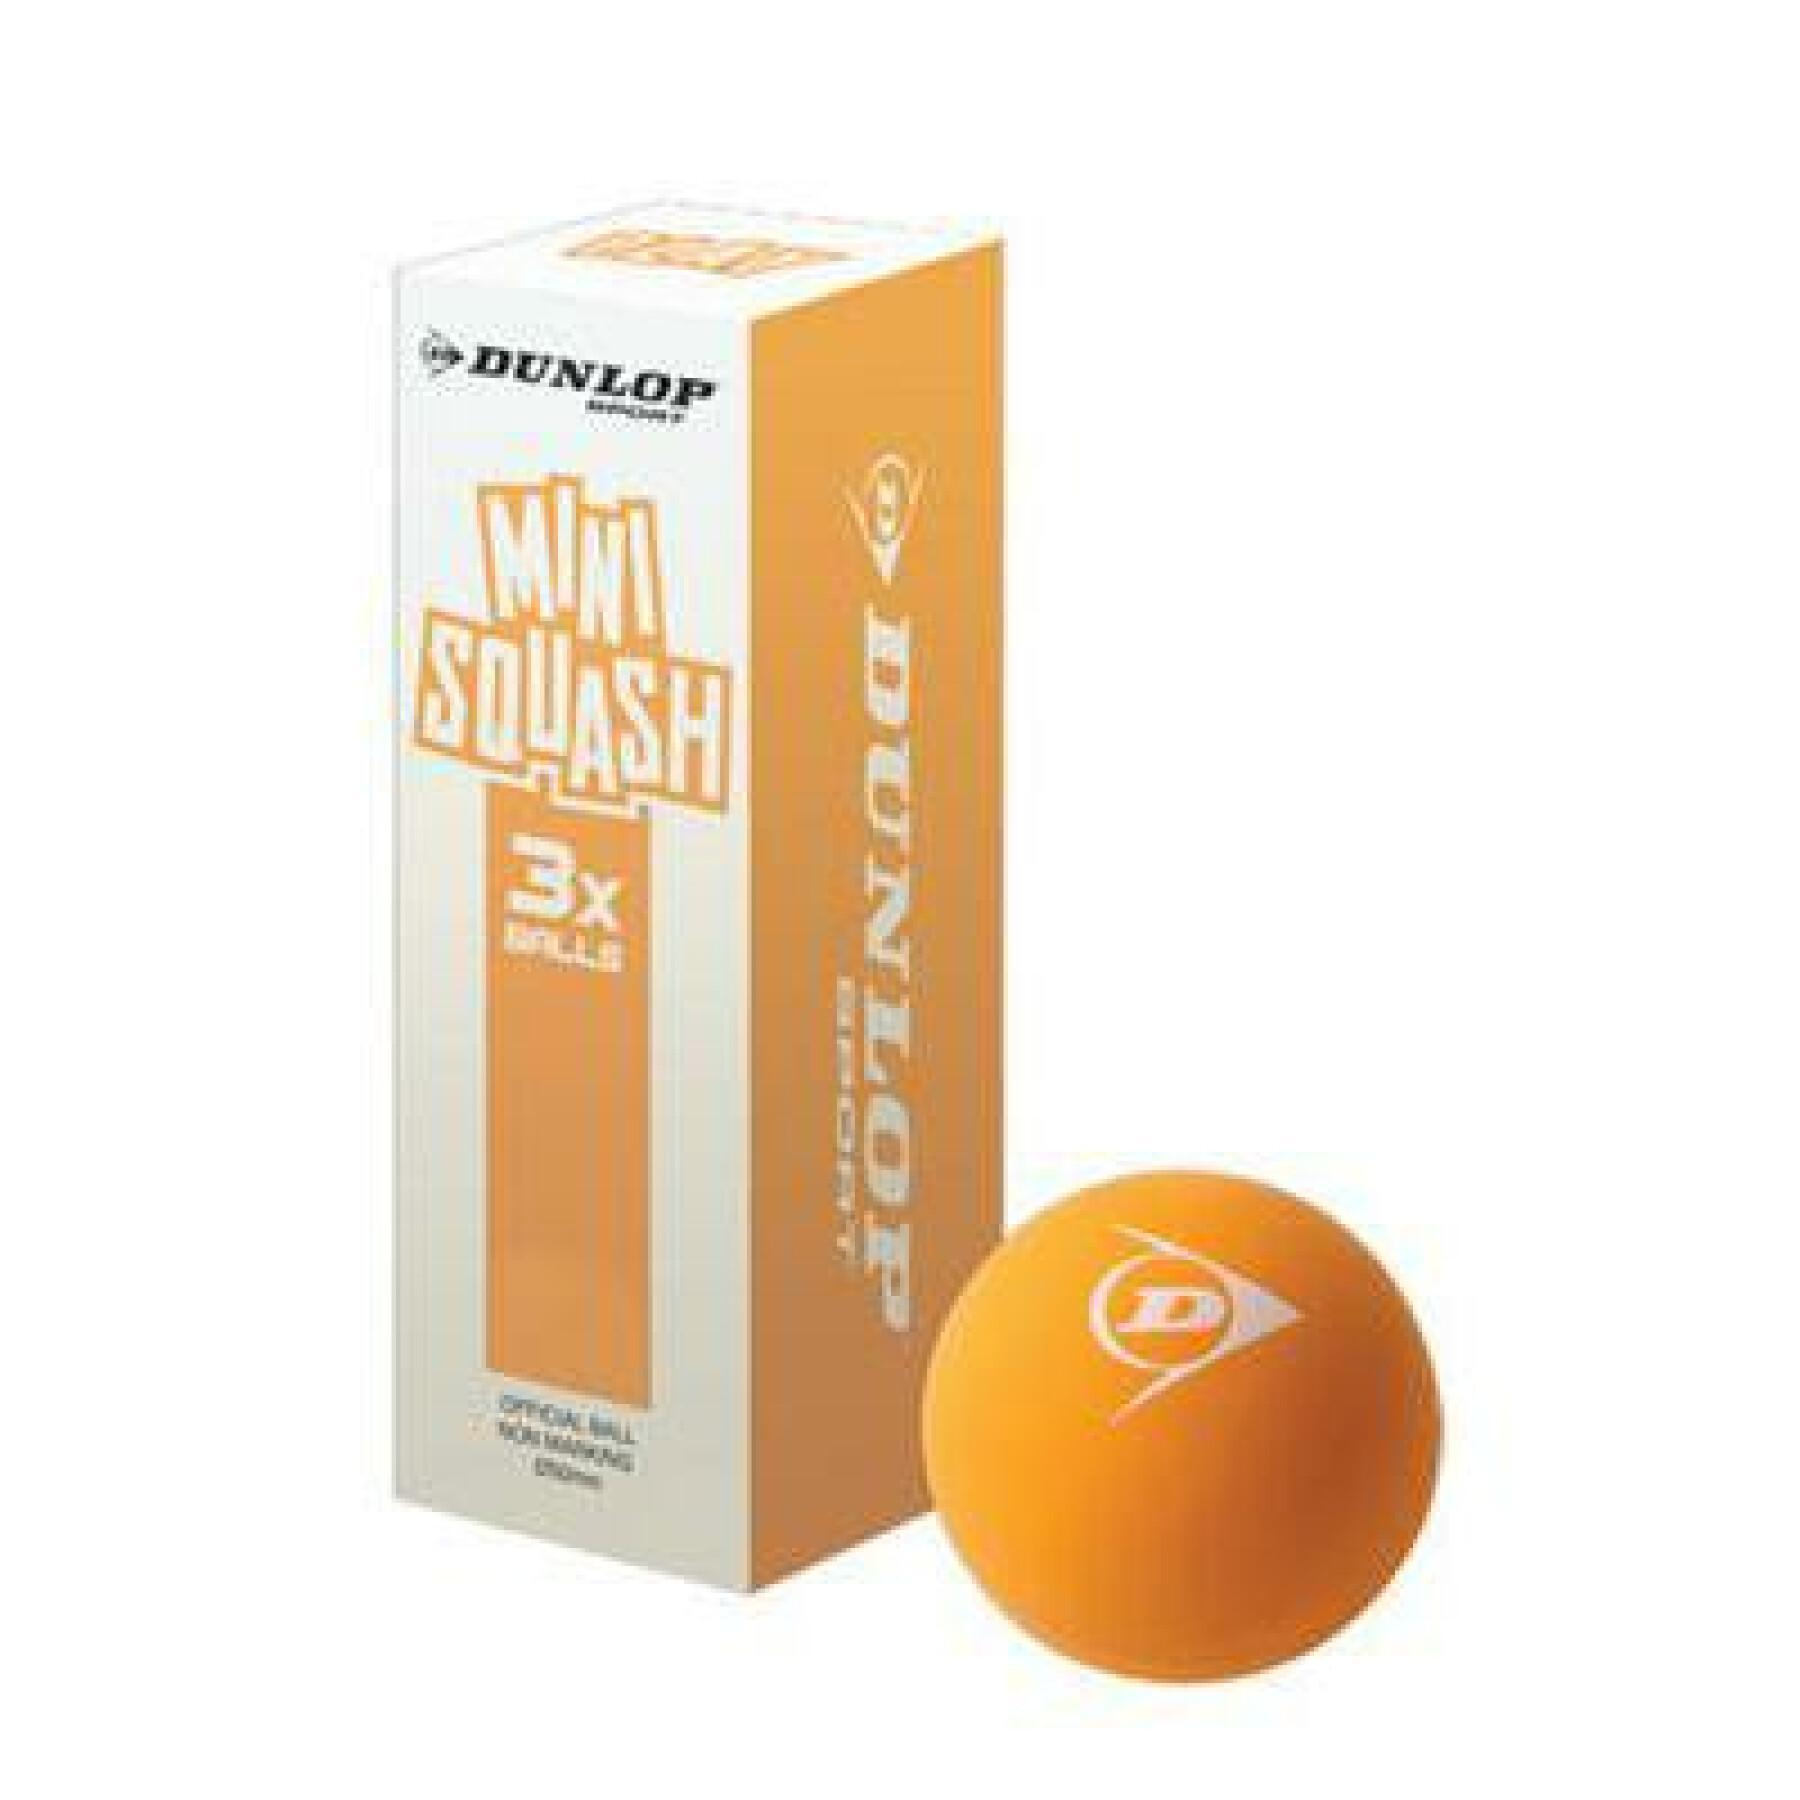 Set of 3 squash balls Dunlop play